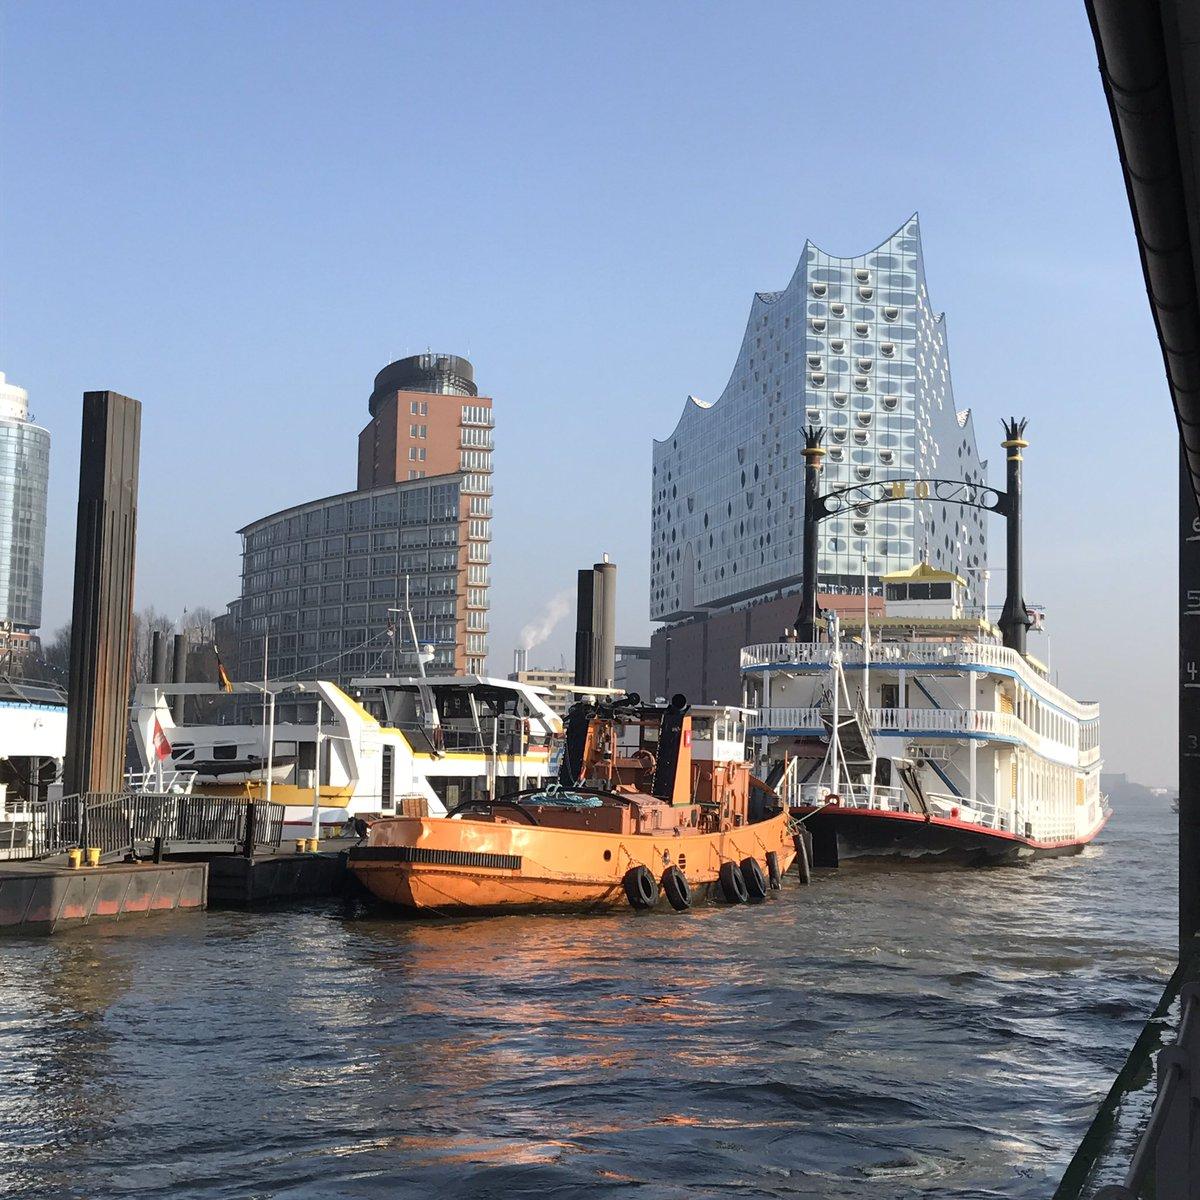 A rare photo: blue sky in Hamburg. #Elbphilharmonie #hamburg #travel #blogger<br>http://pic.twitter.com/E9bkfKJYwS